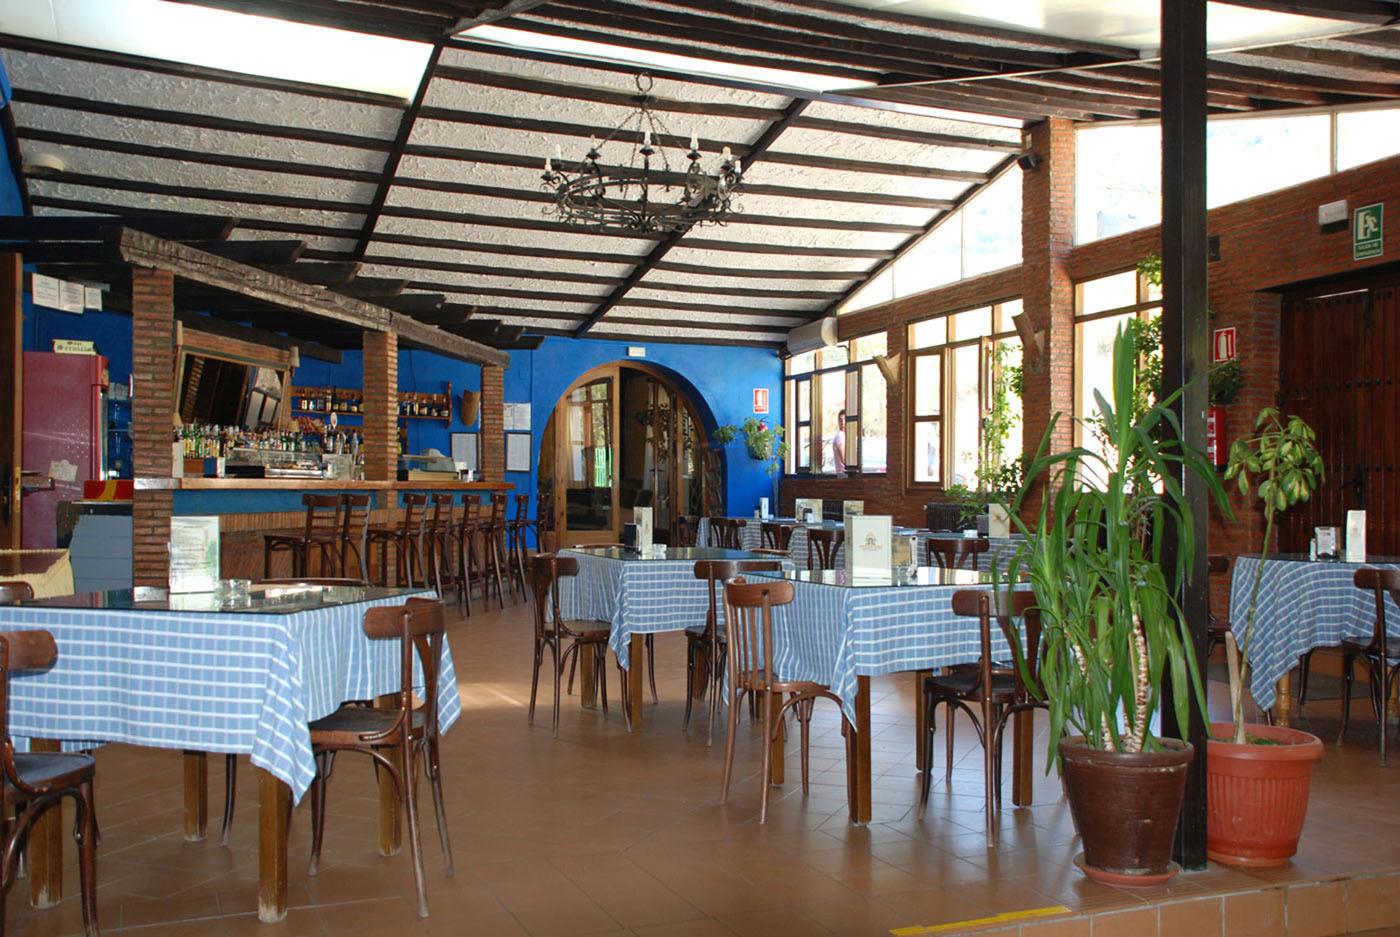 Hotel Cueva del Fraile